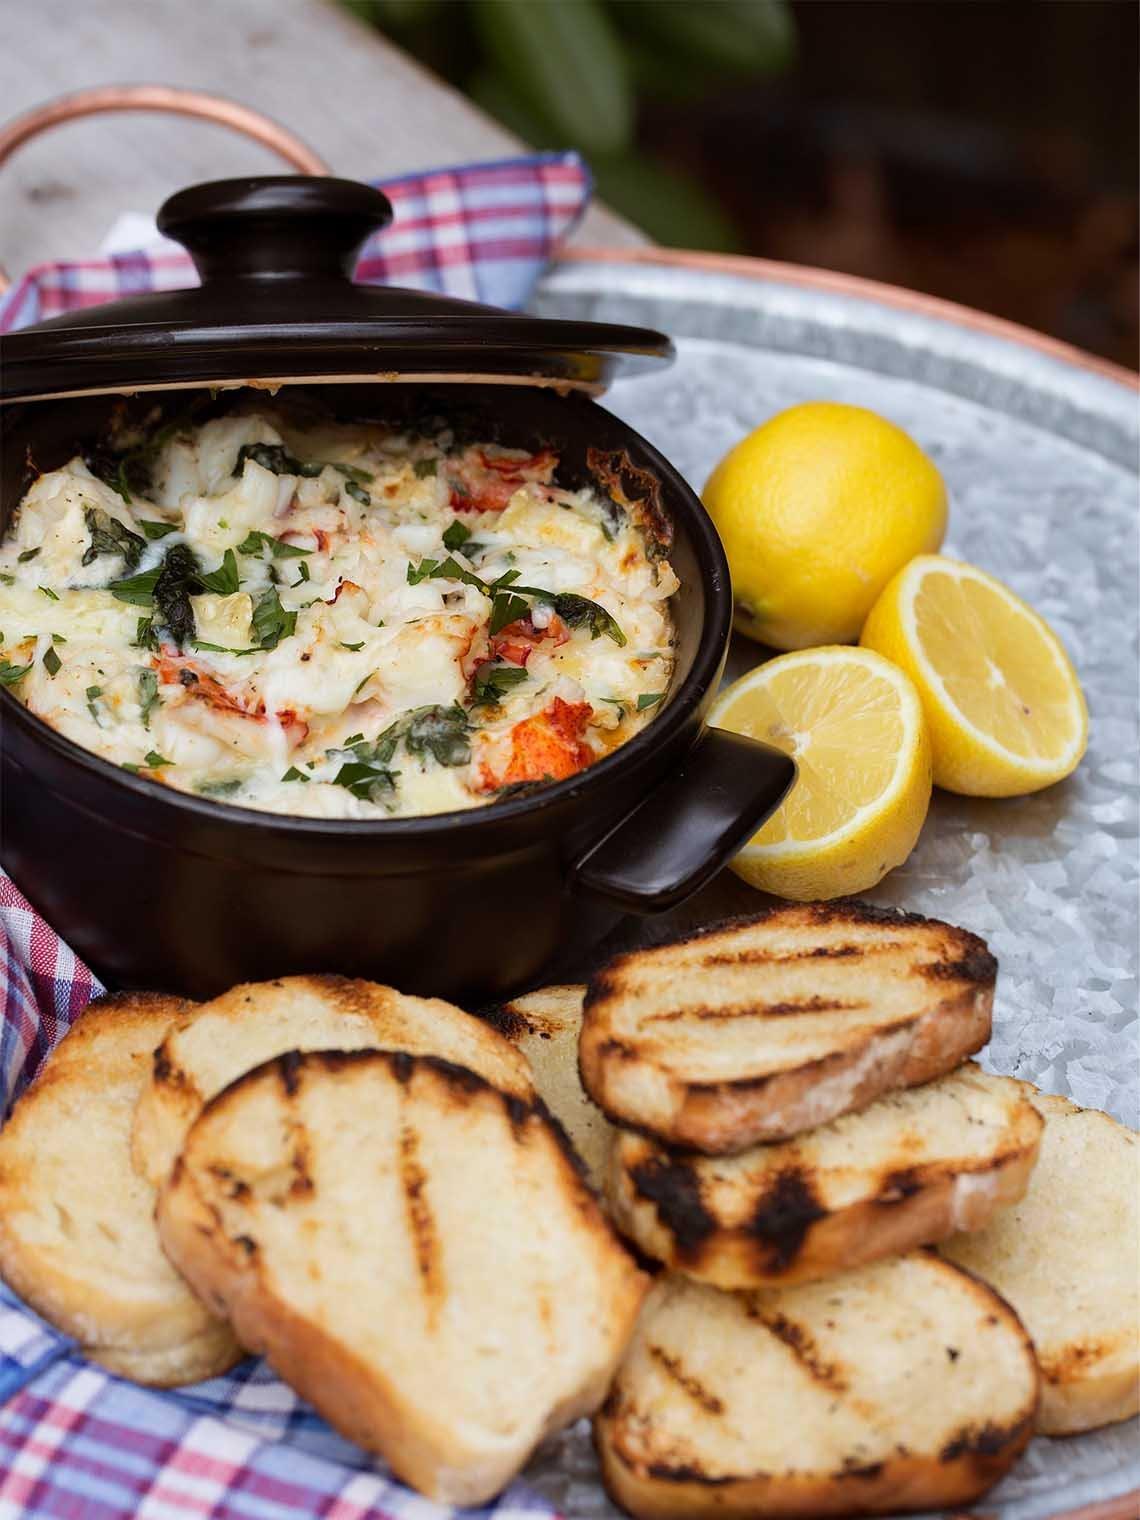 Baked Maine Lobster & Brie Dip